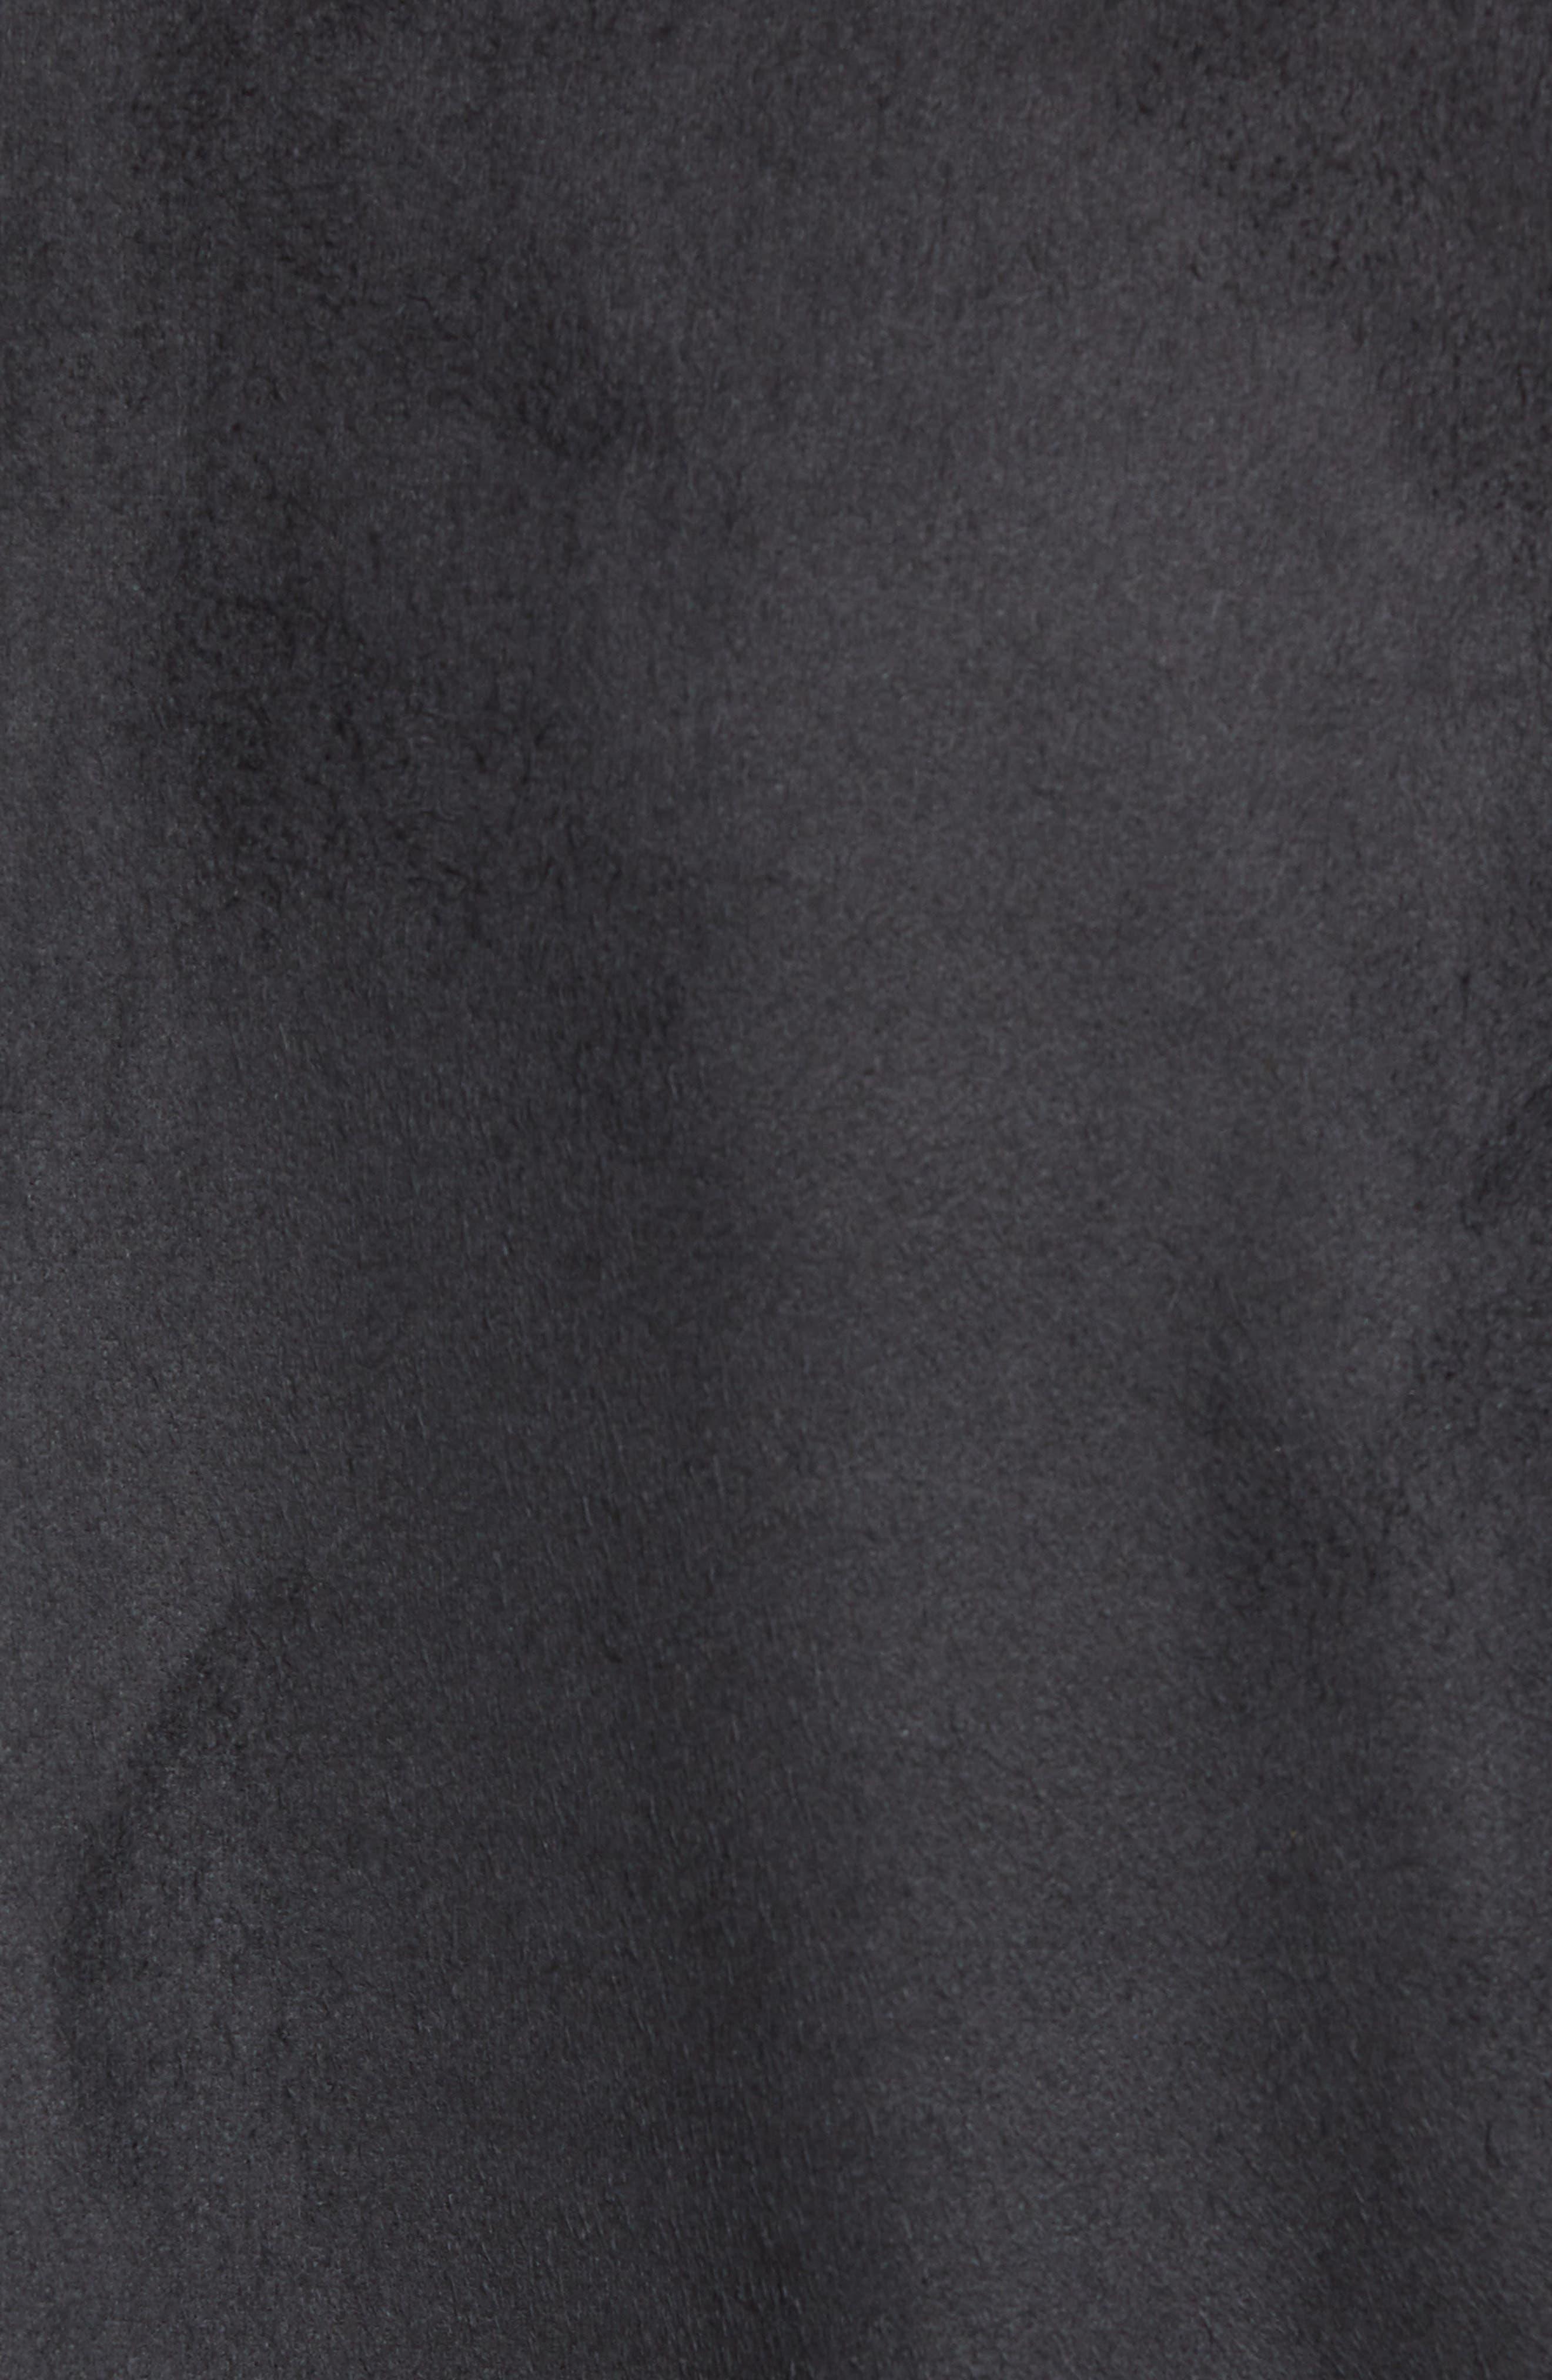 Faux Suede Bomber Jacket,                             Alternate thumbnail 6, color,                             BLACK